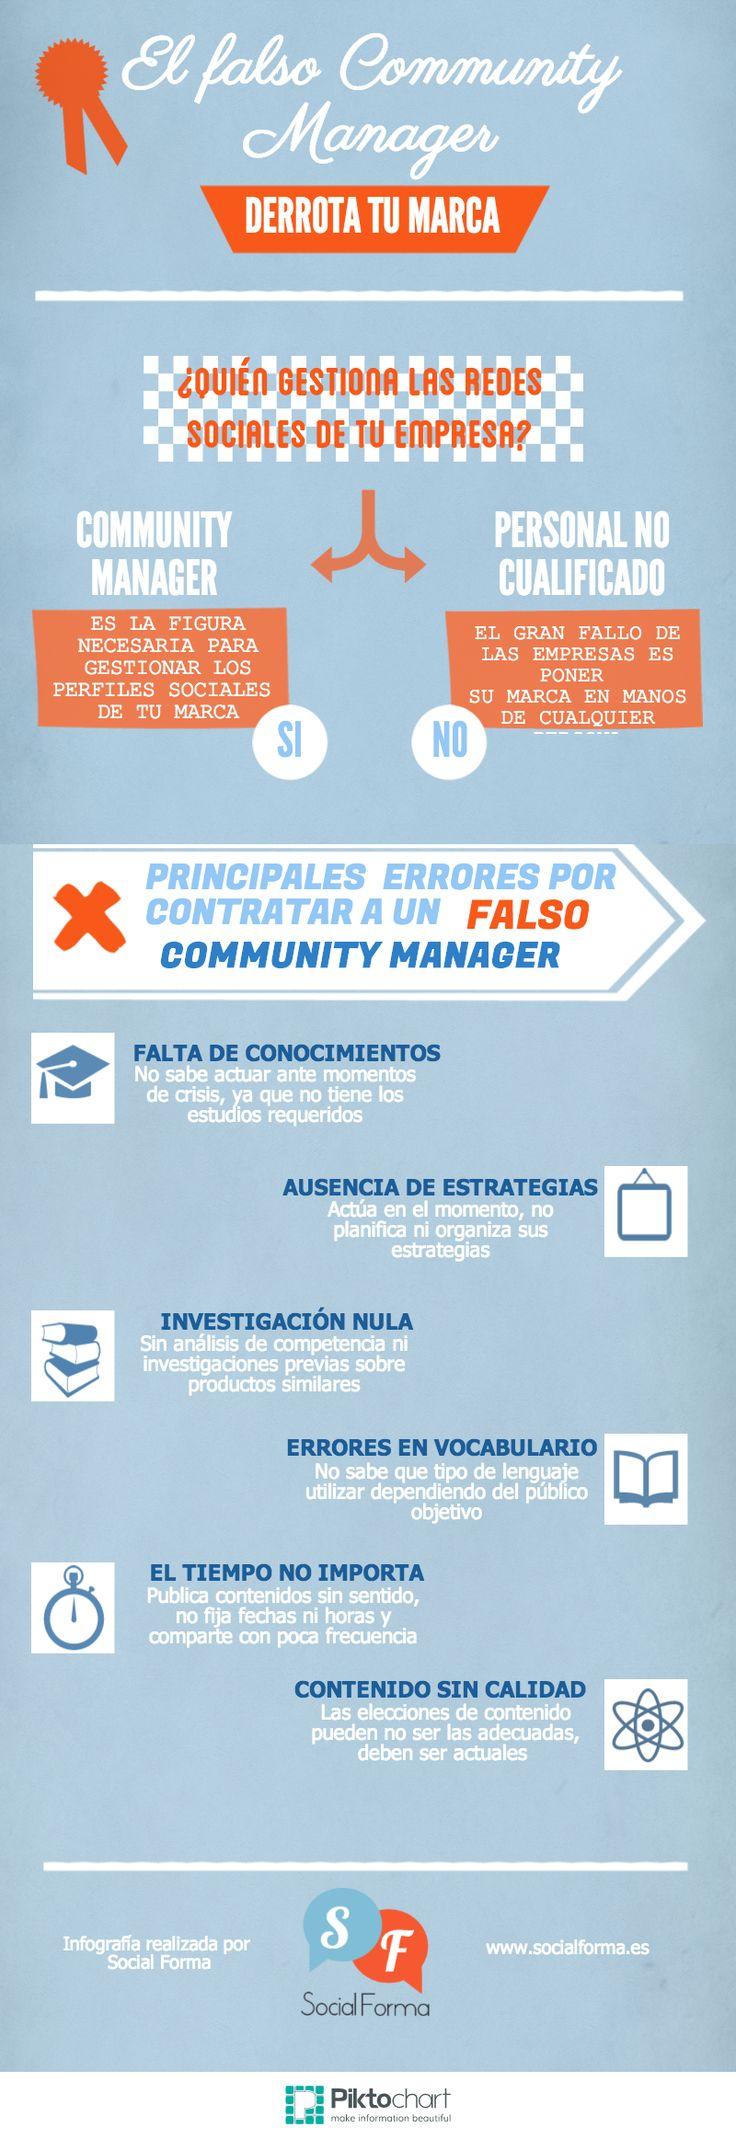 infografia_el_falso_community_manager.png (800×2326)